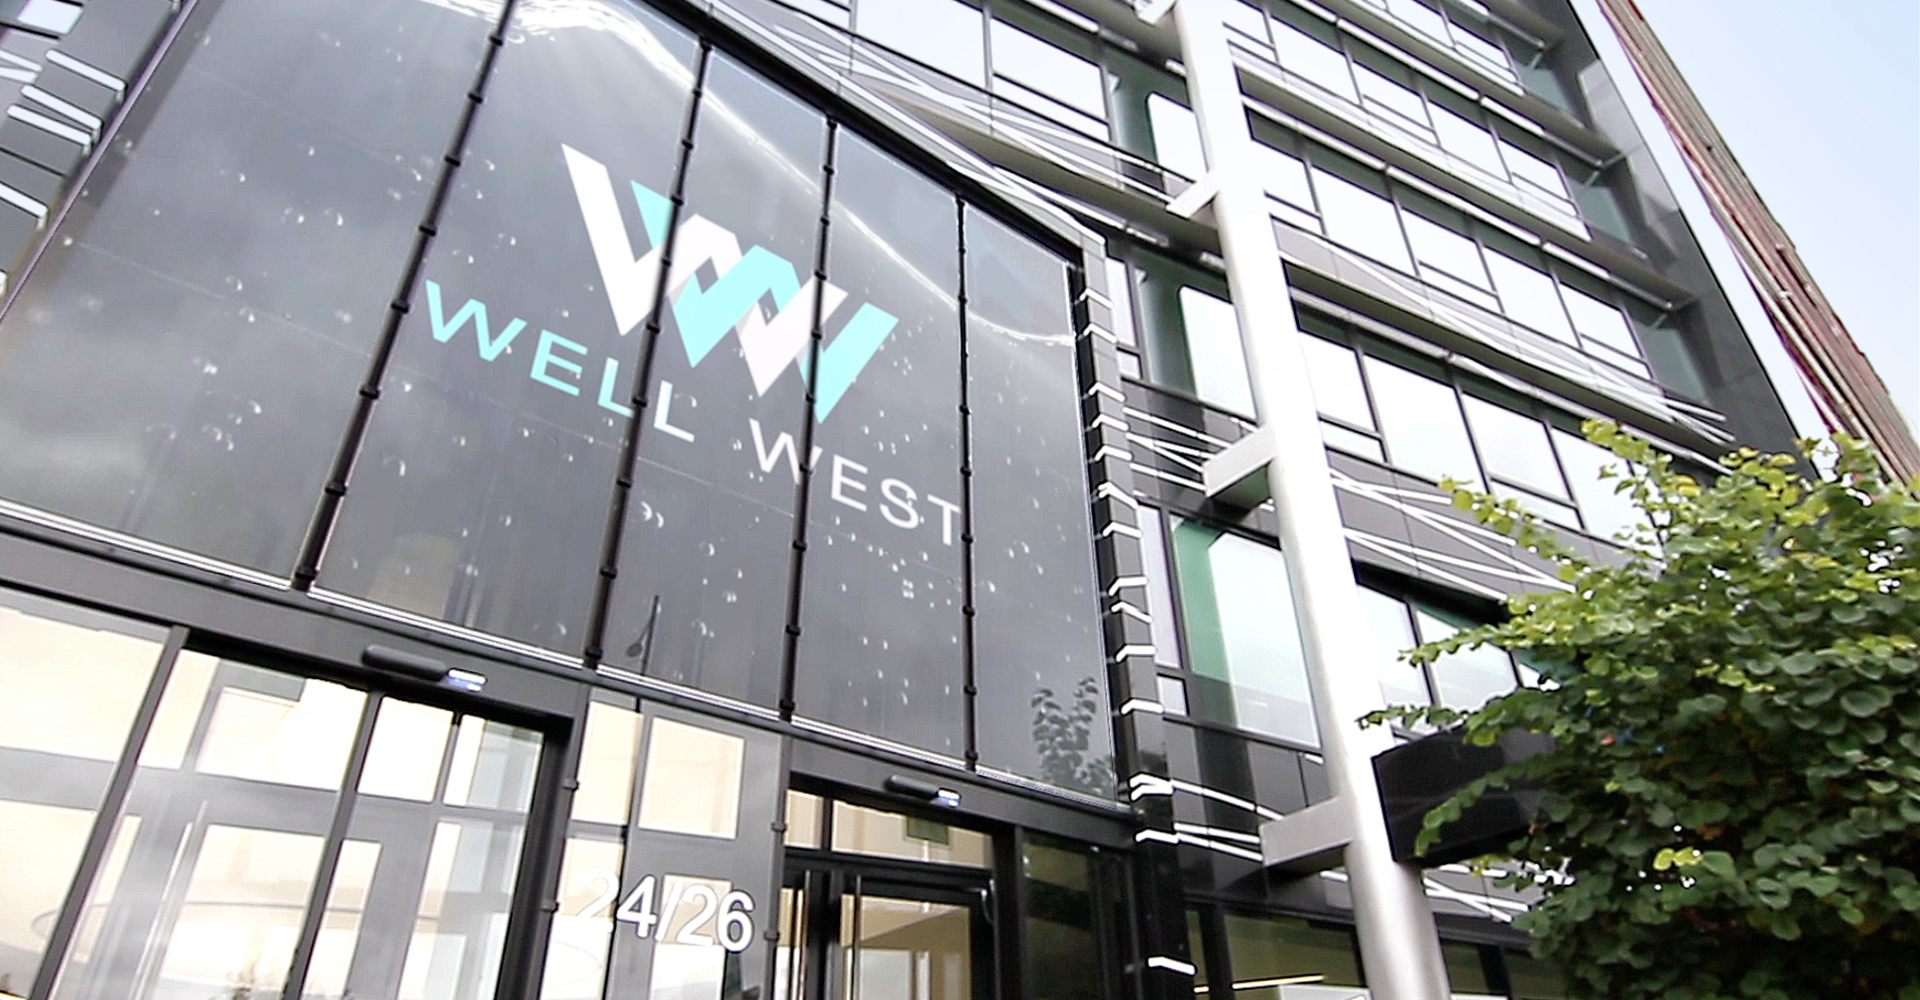 wellwest-admemori-1